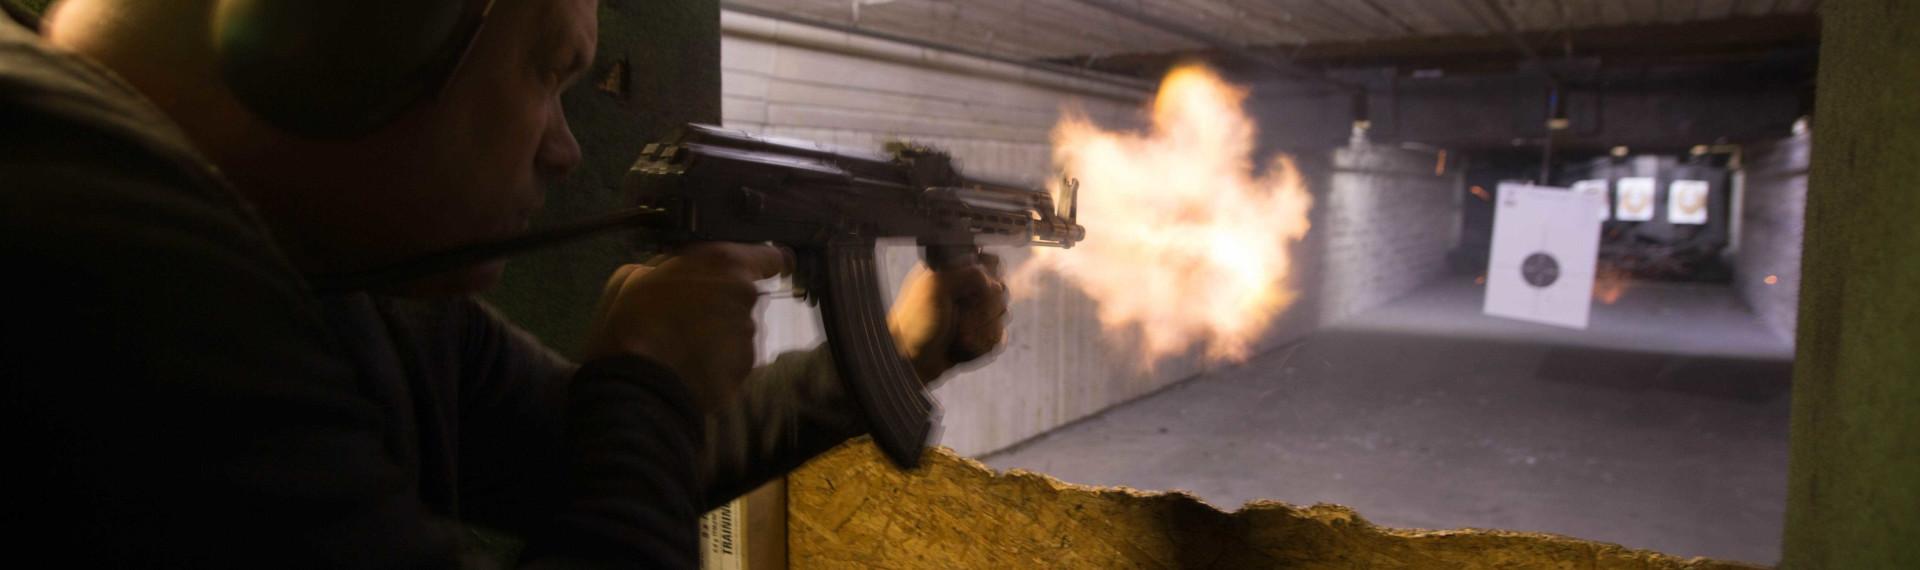 AK-47 Extreme Budapest